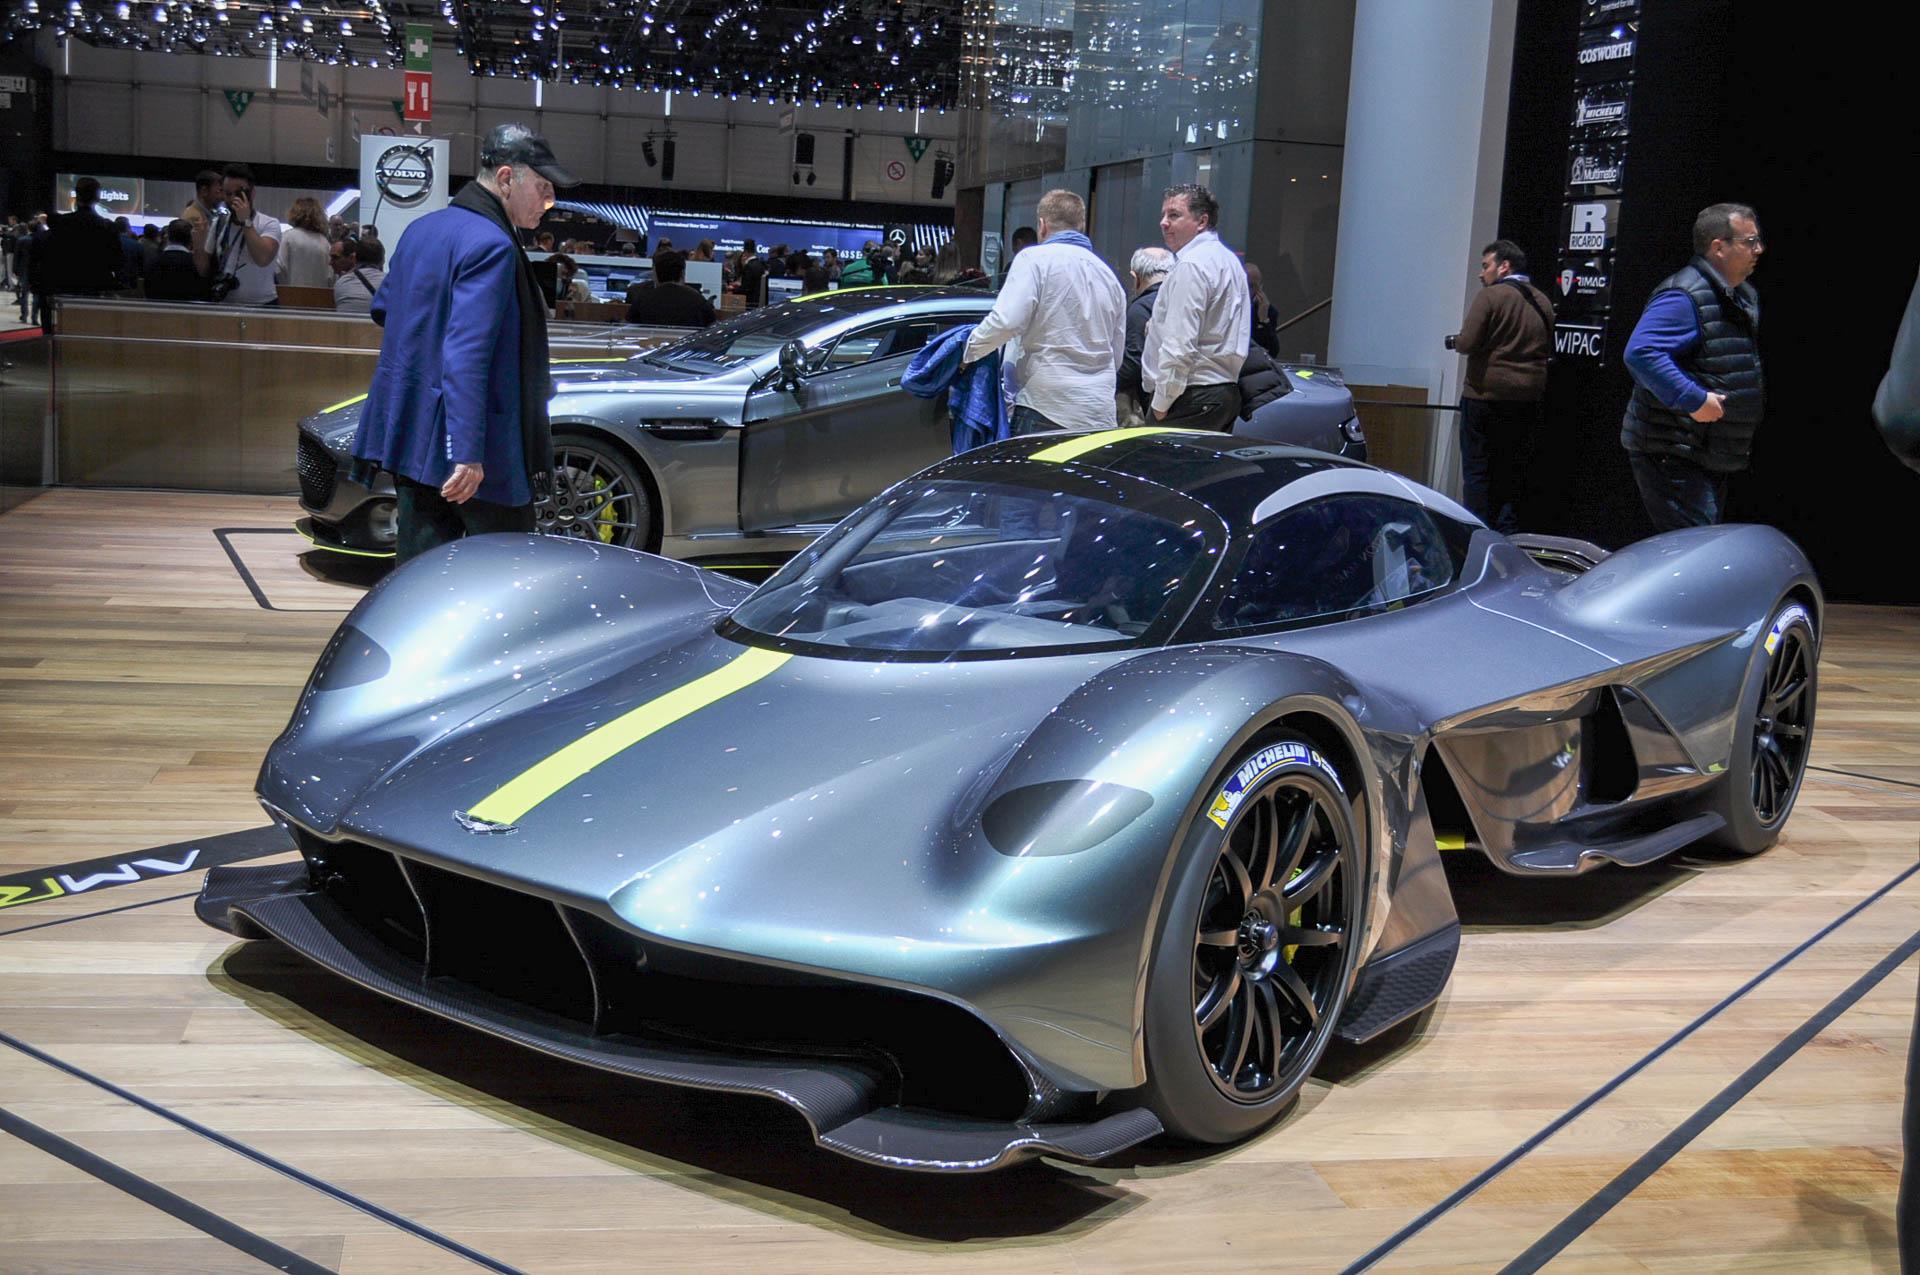 Aston Martin hypercar named Valkyrie, presented in Geneva